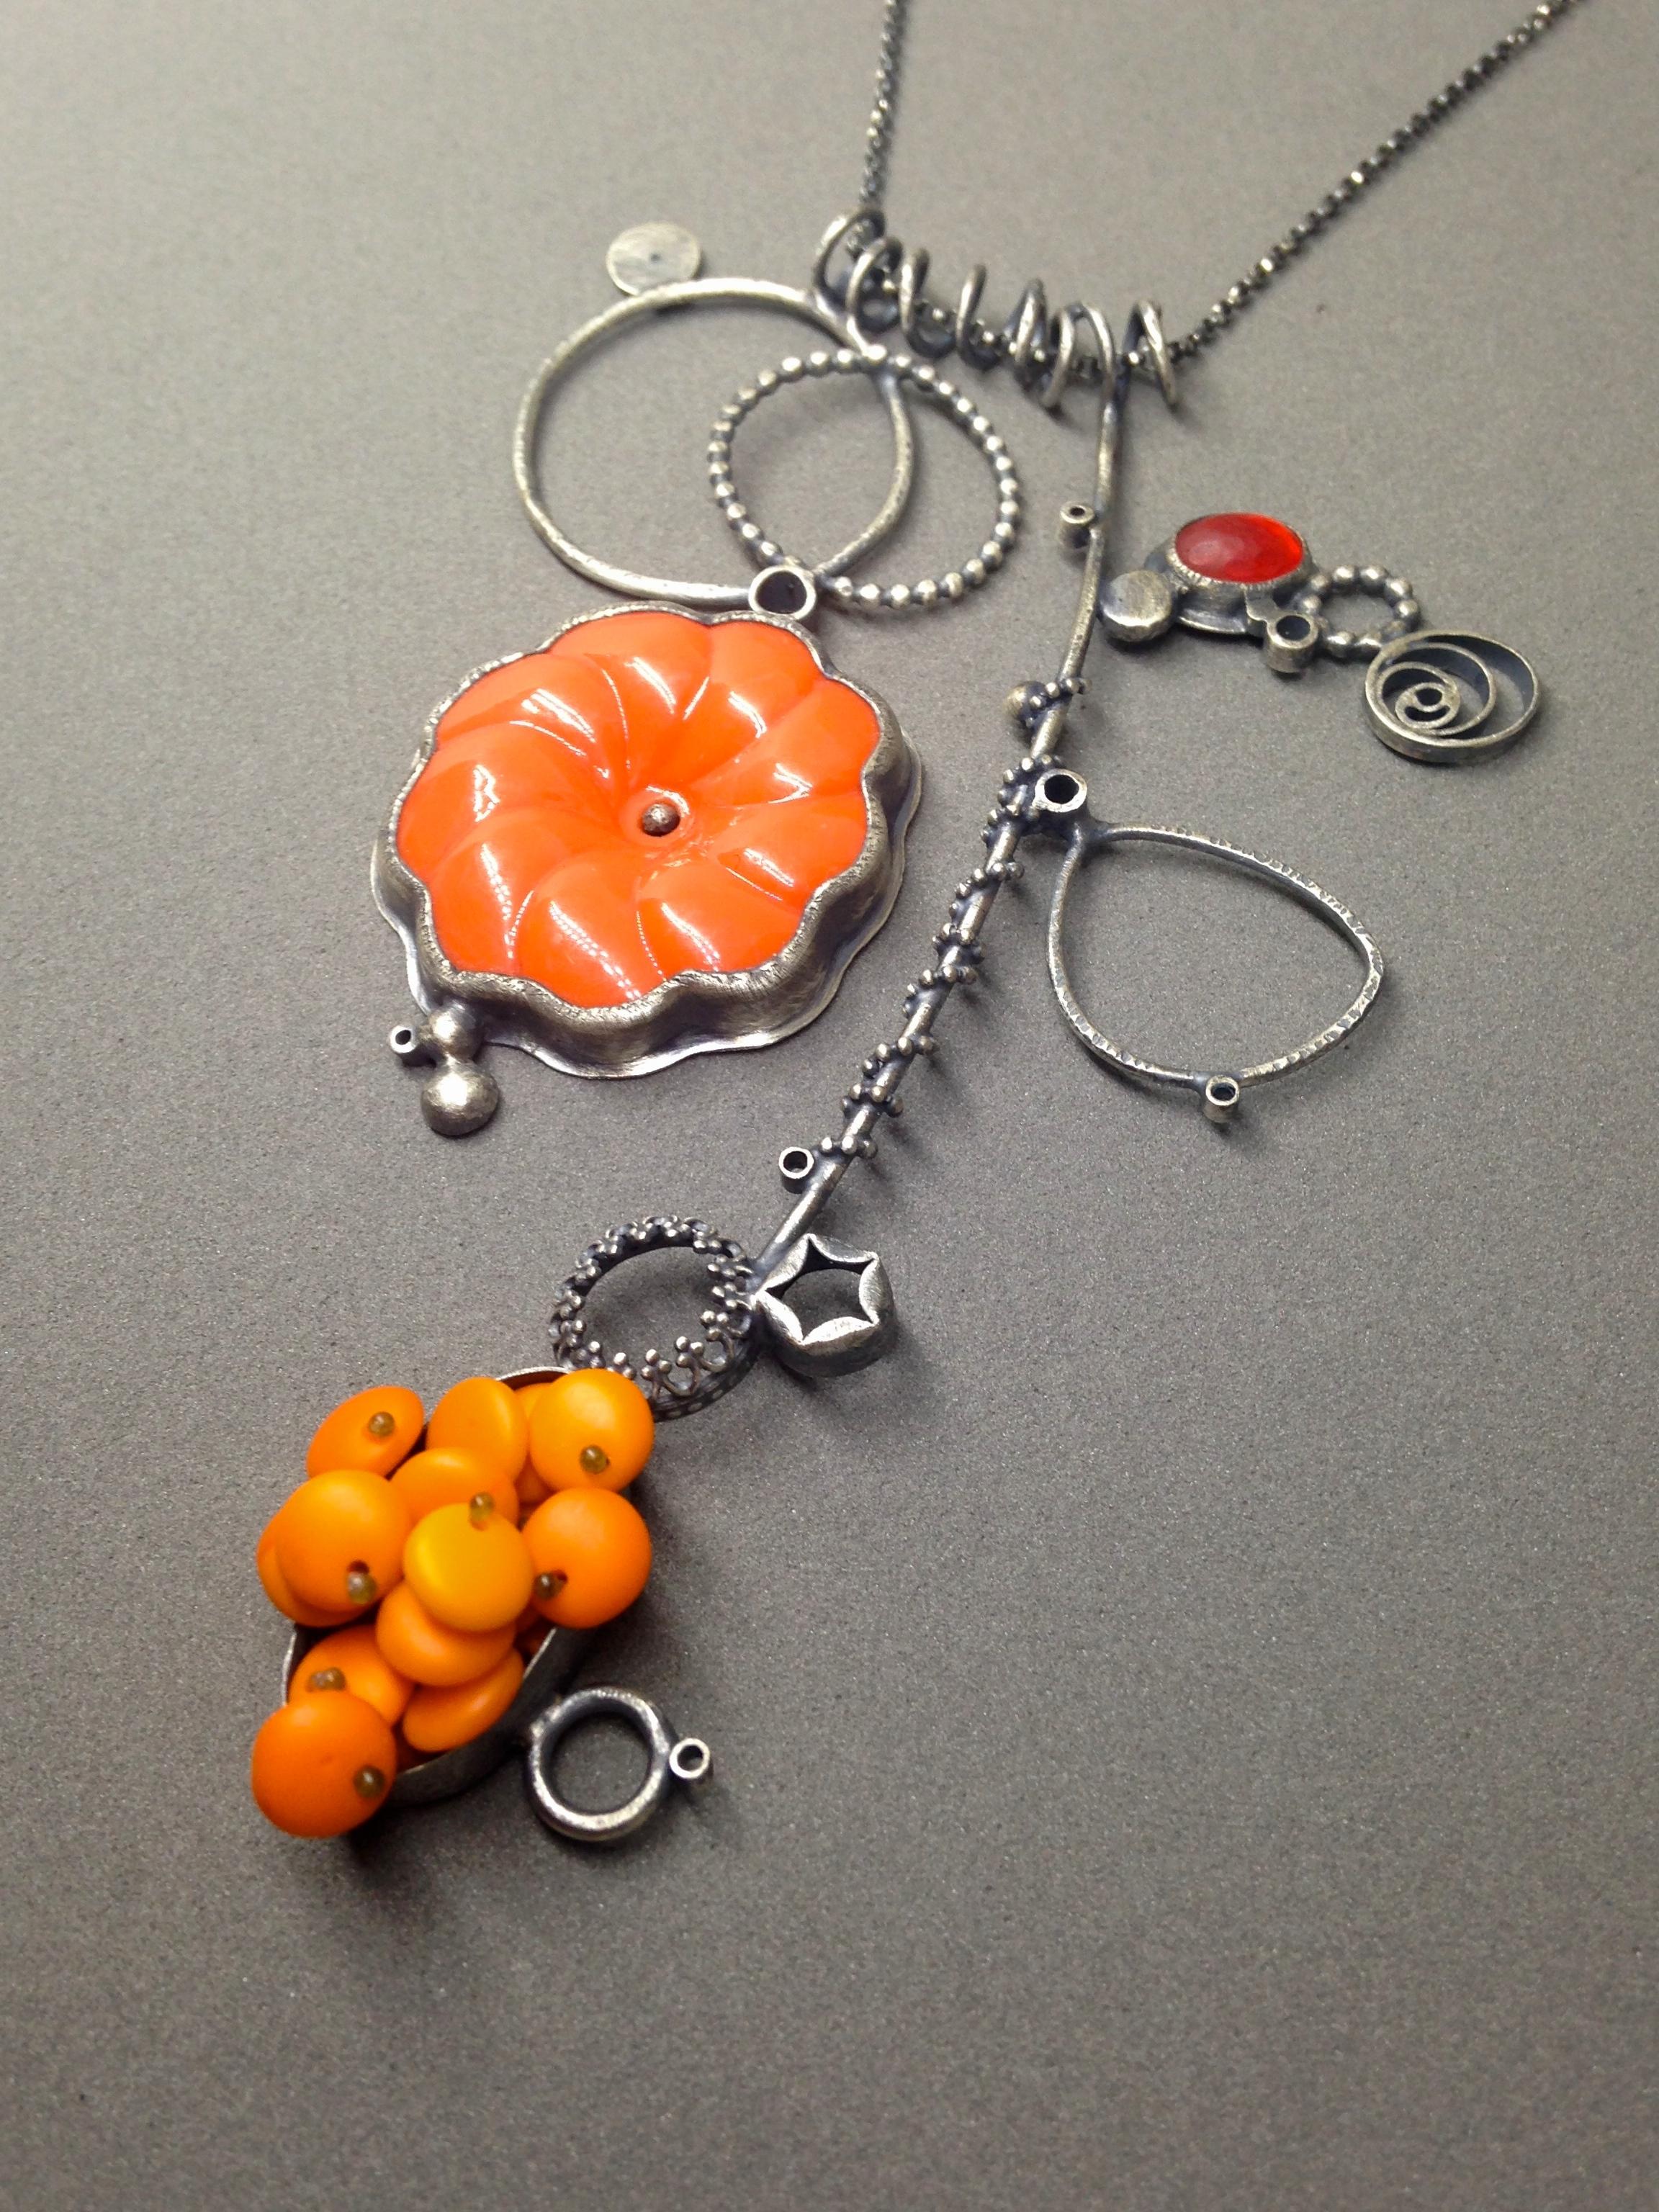 orange polyp collage necklace: